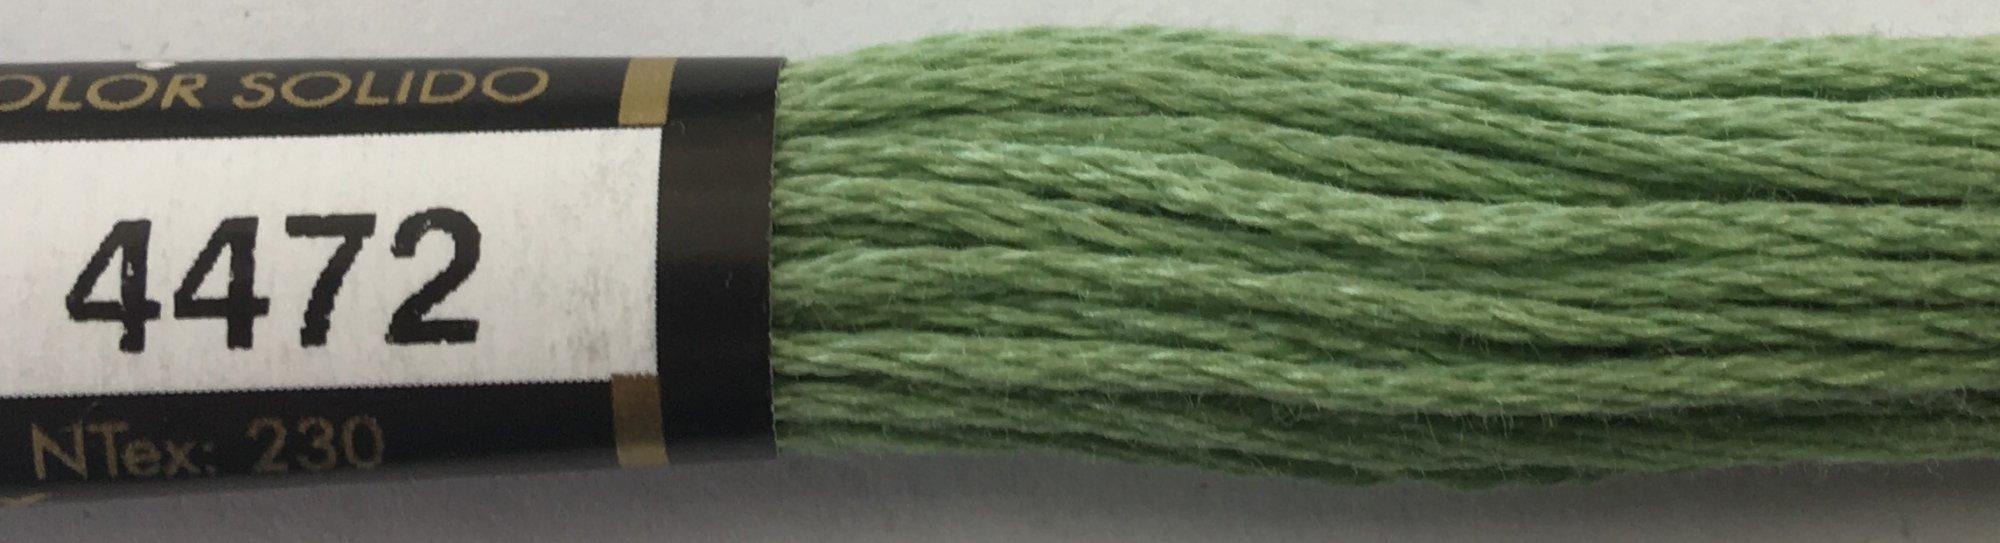 F4472 Presencia 100% Mercerized Finca Cotton 6 ply Embroidery Floss 8 meter skein